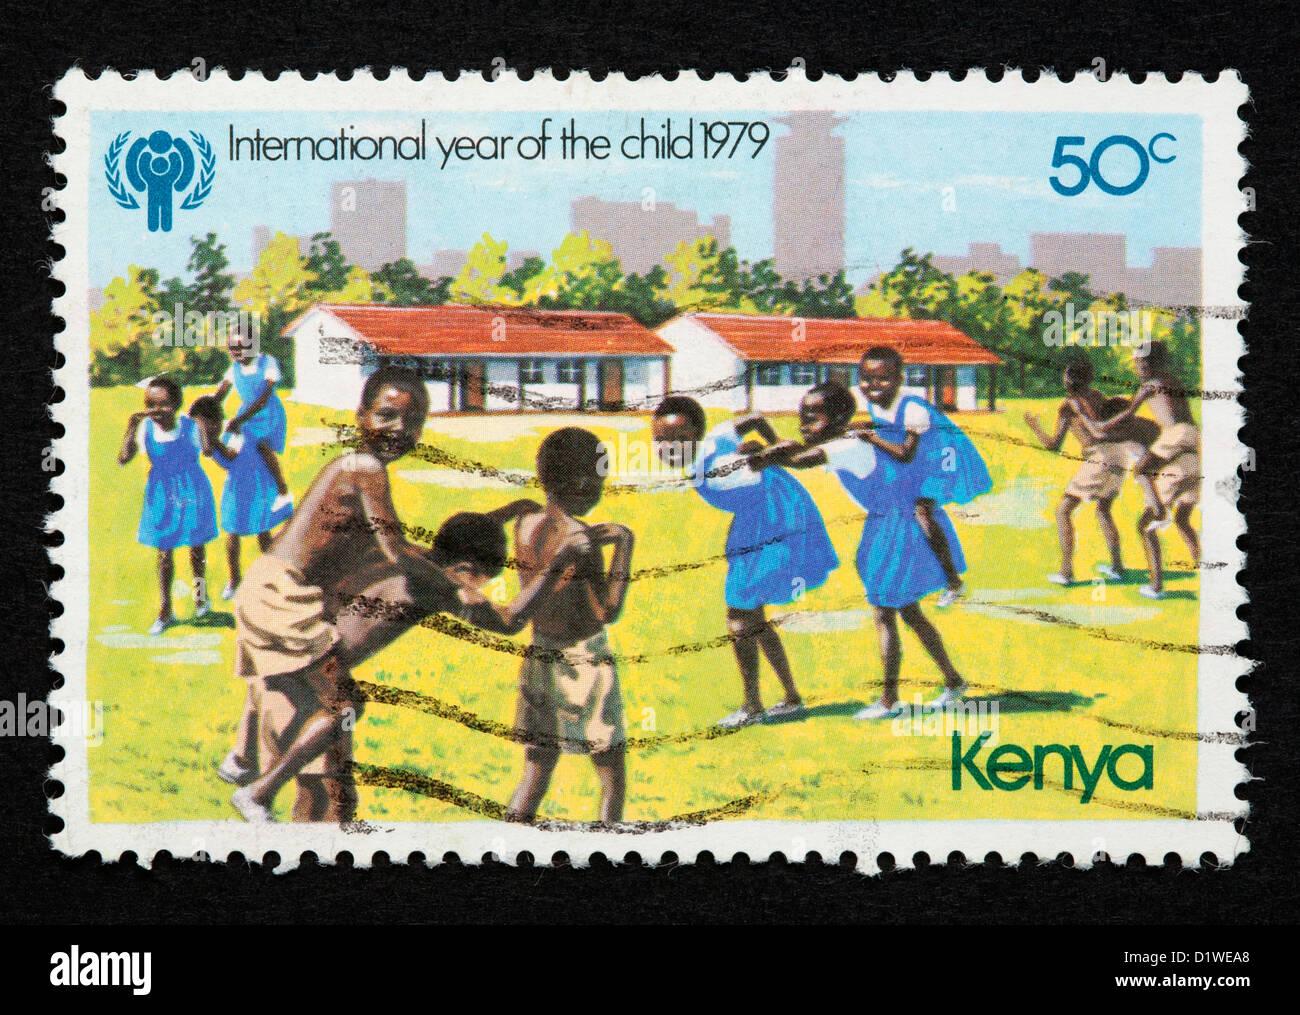 Kenya postage stamp Stock Photo